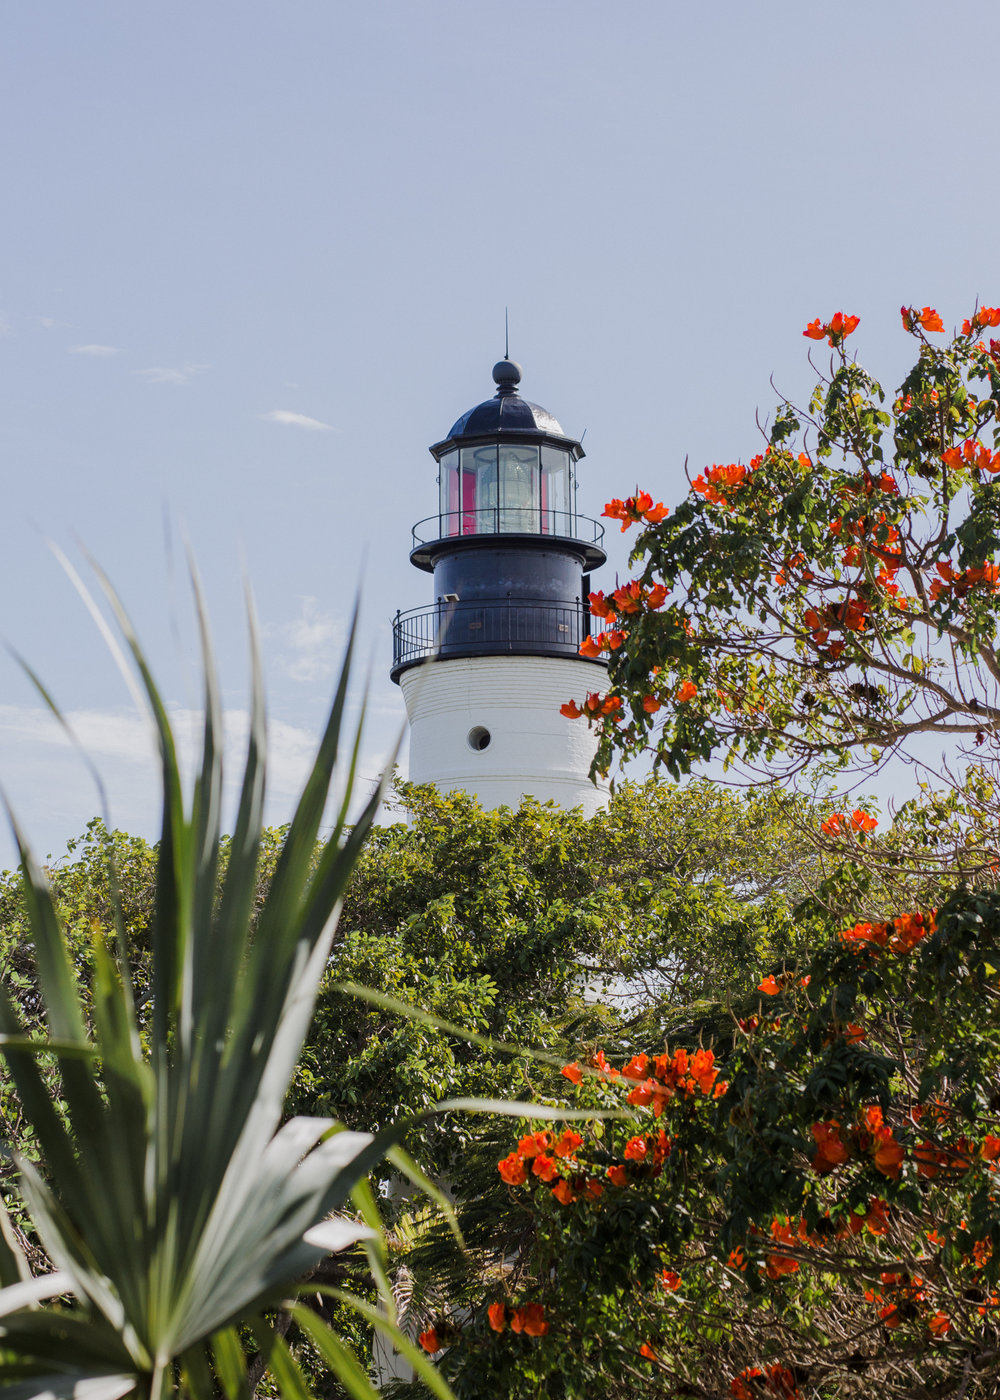 key west lighthouse, lena perkins wedding photographer, visit florida, duval street, things to see.jpg